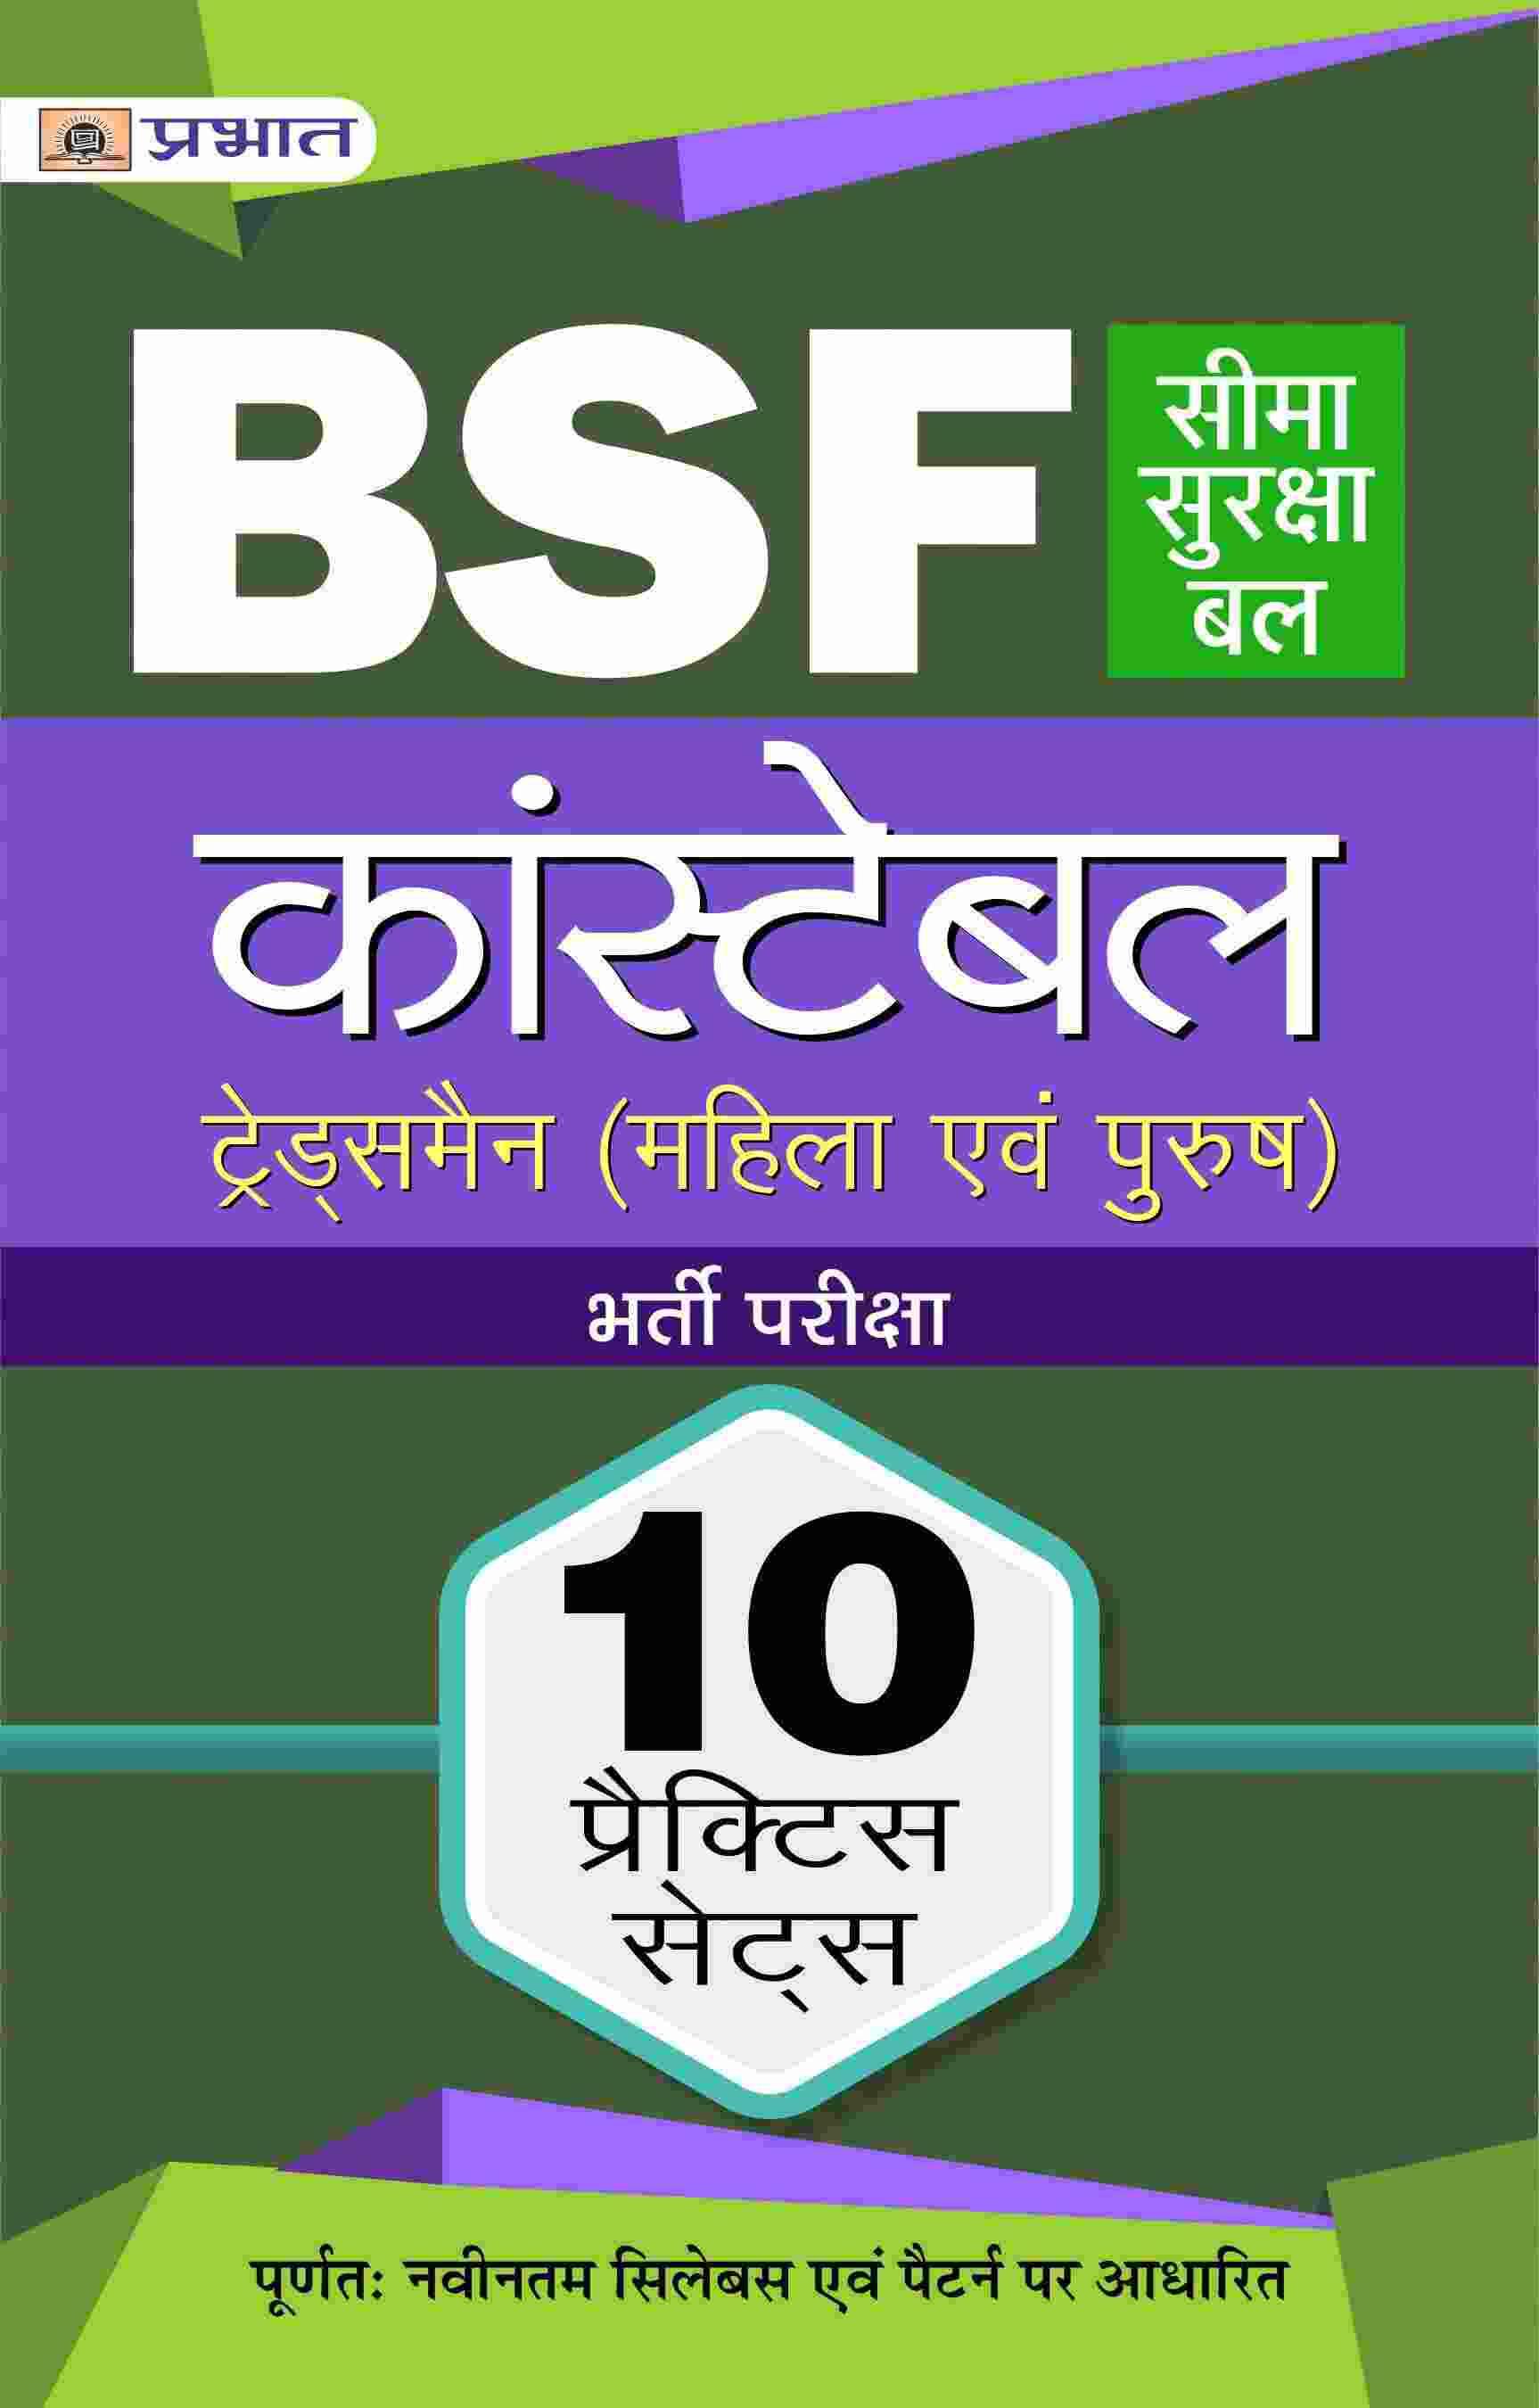 BSF Seema Suraksha Bal Constable Tradesmen (Mahila Evam Purush) Bharti...